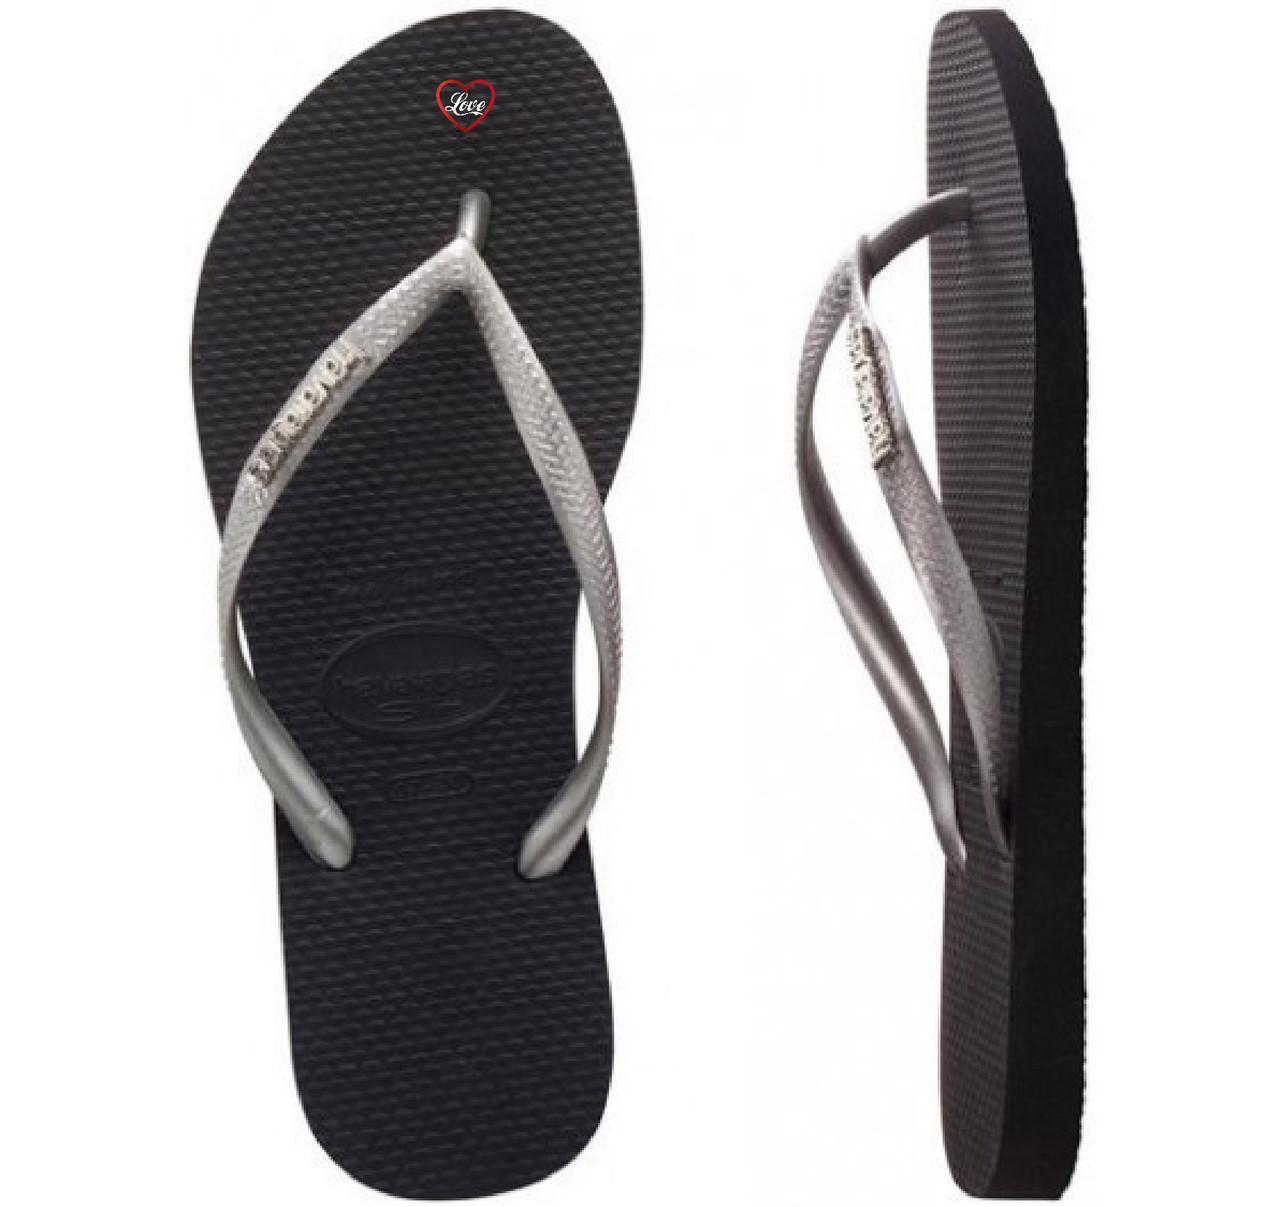 a041591f632912 Havaianas Slim Metal Logo Black Silver Silver - Golders Toowoomba